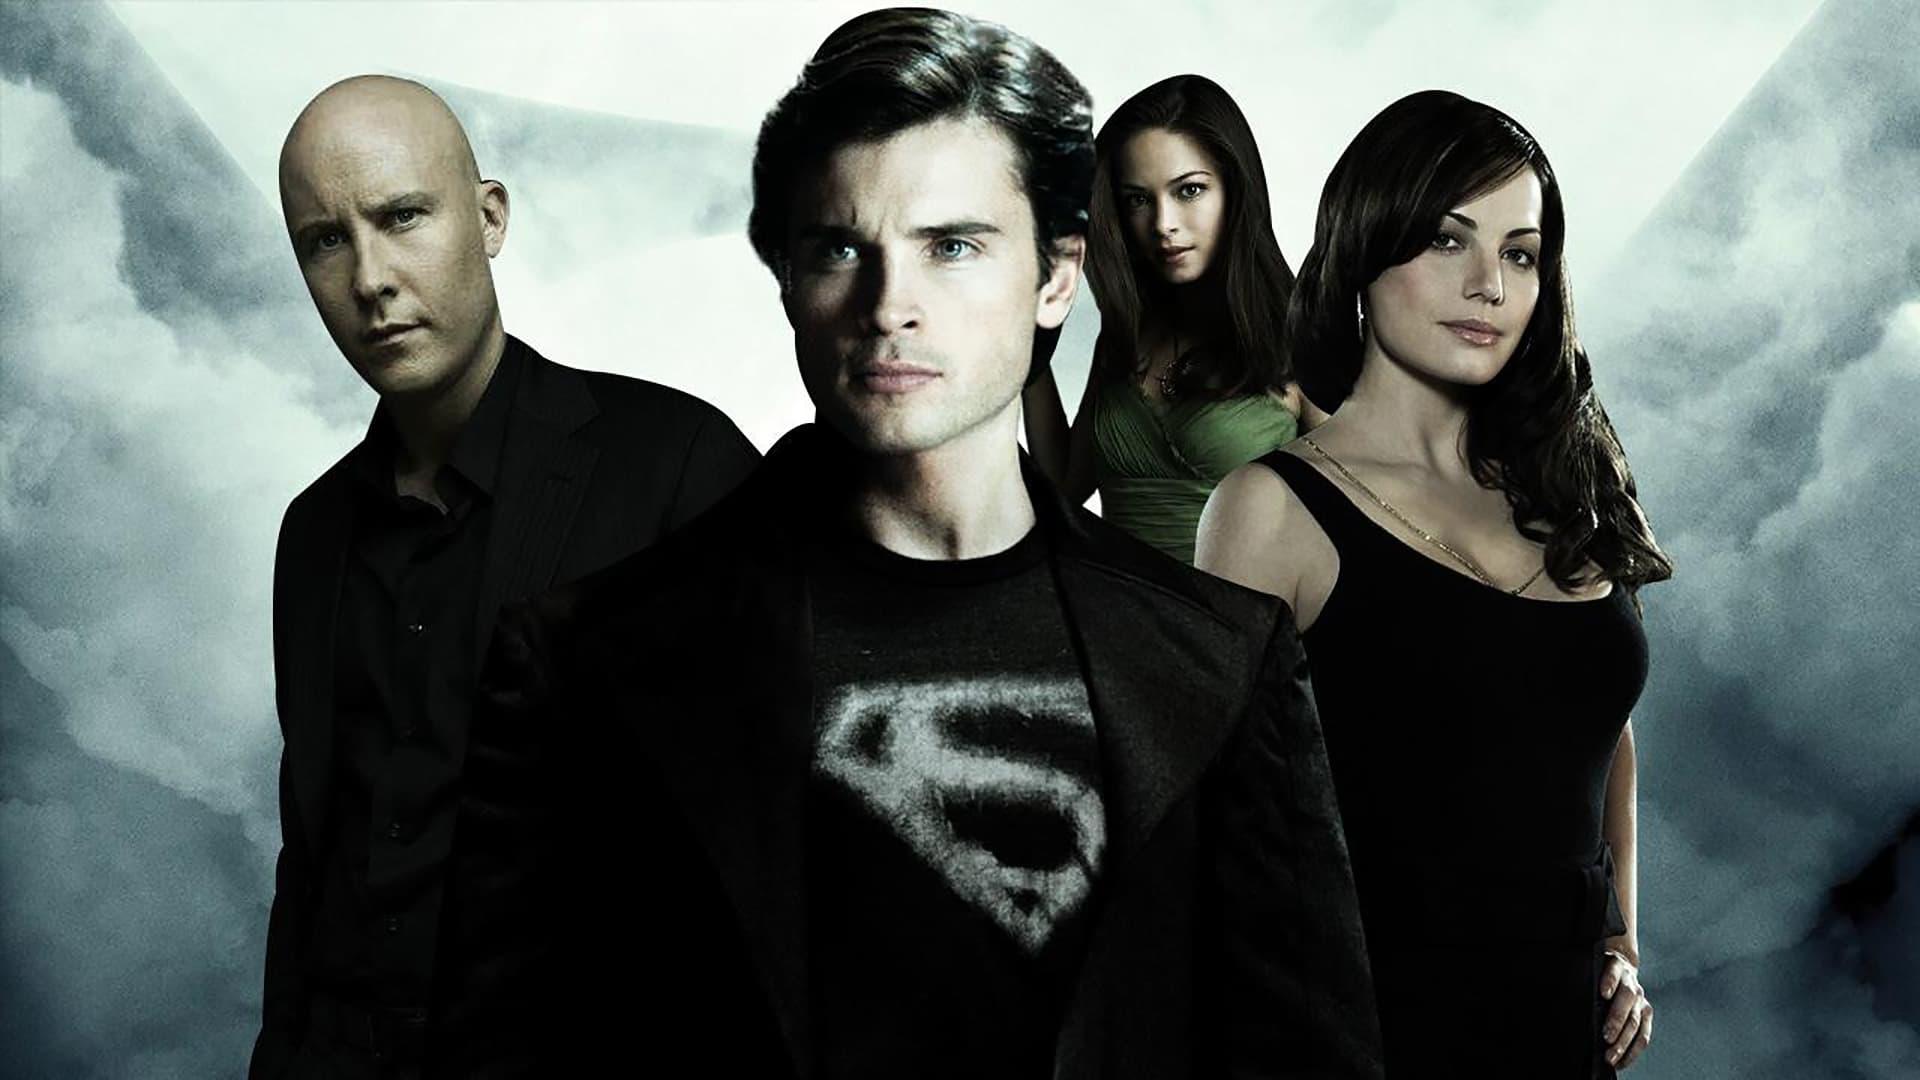 Smallville - Season 10 Episode 21 Finale